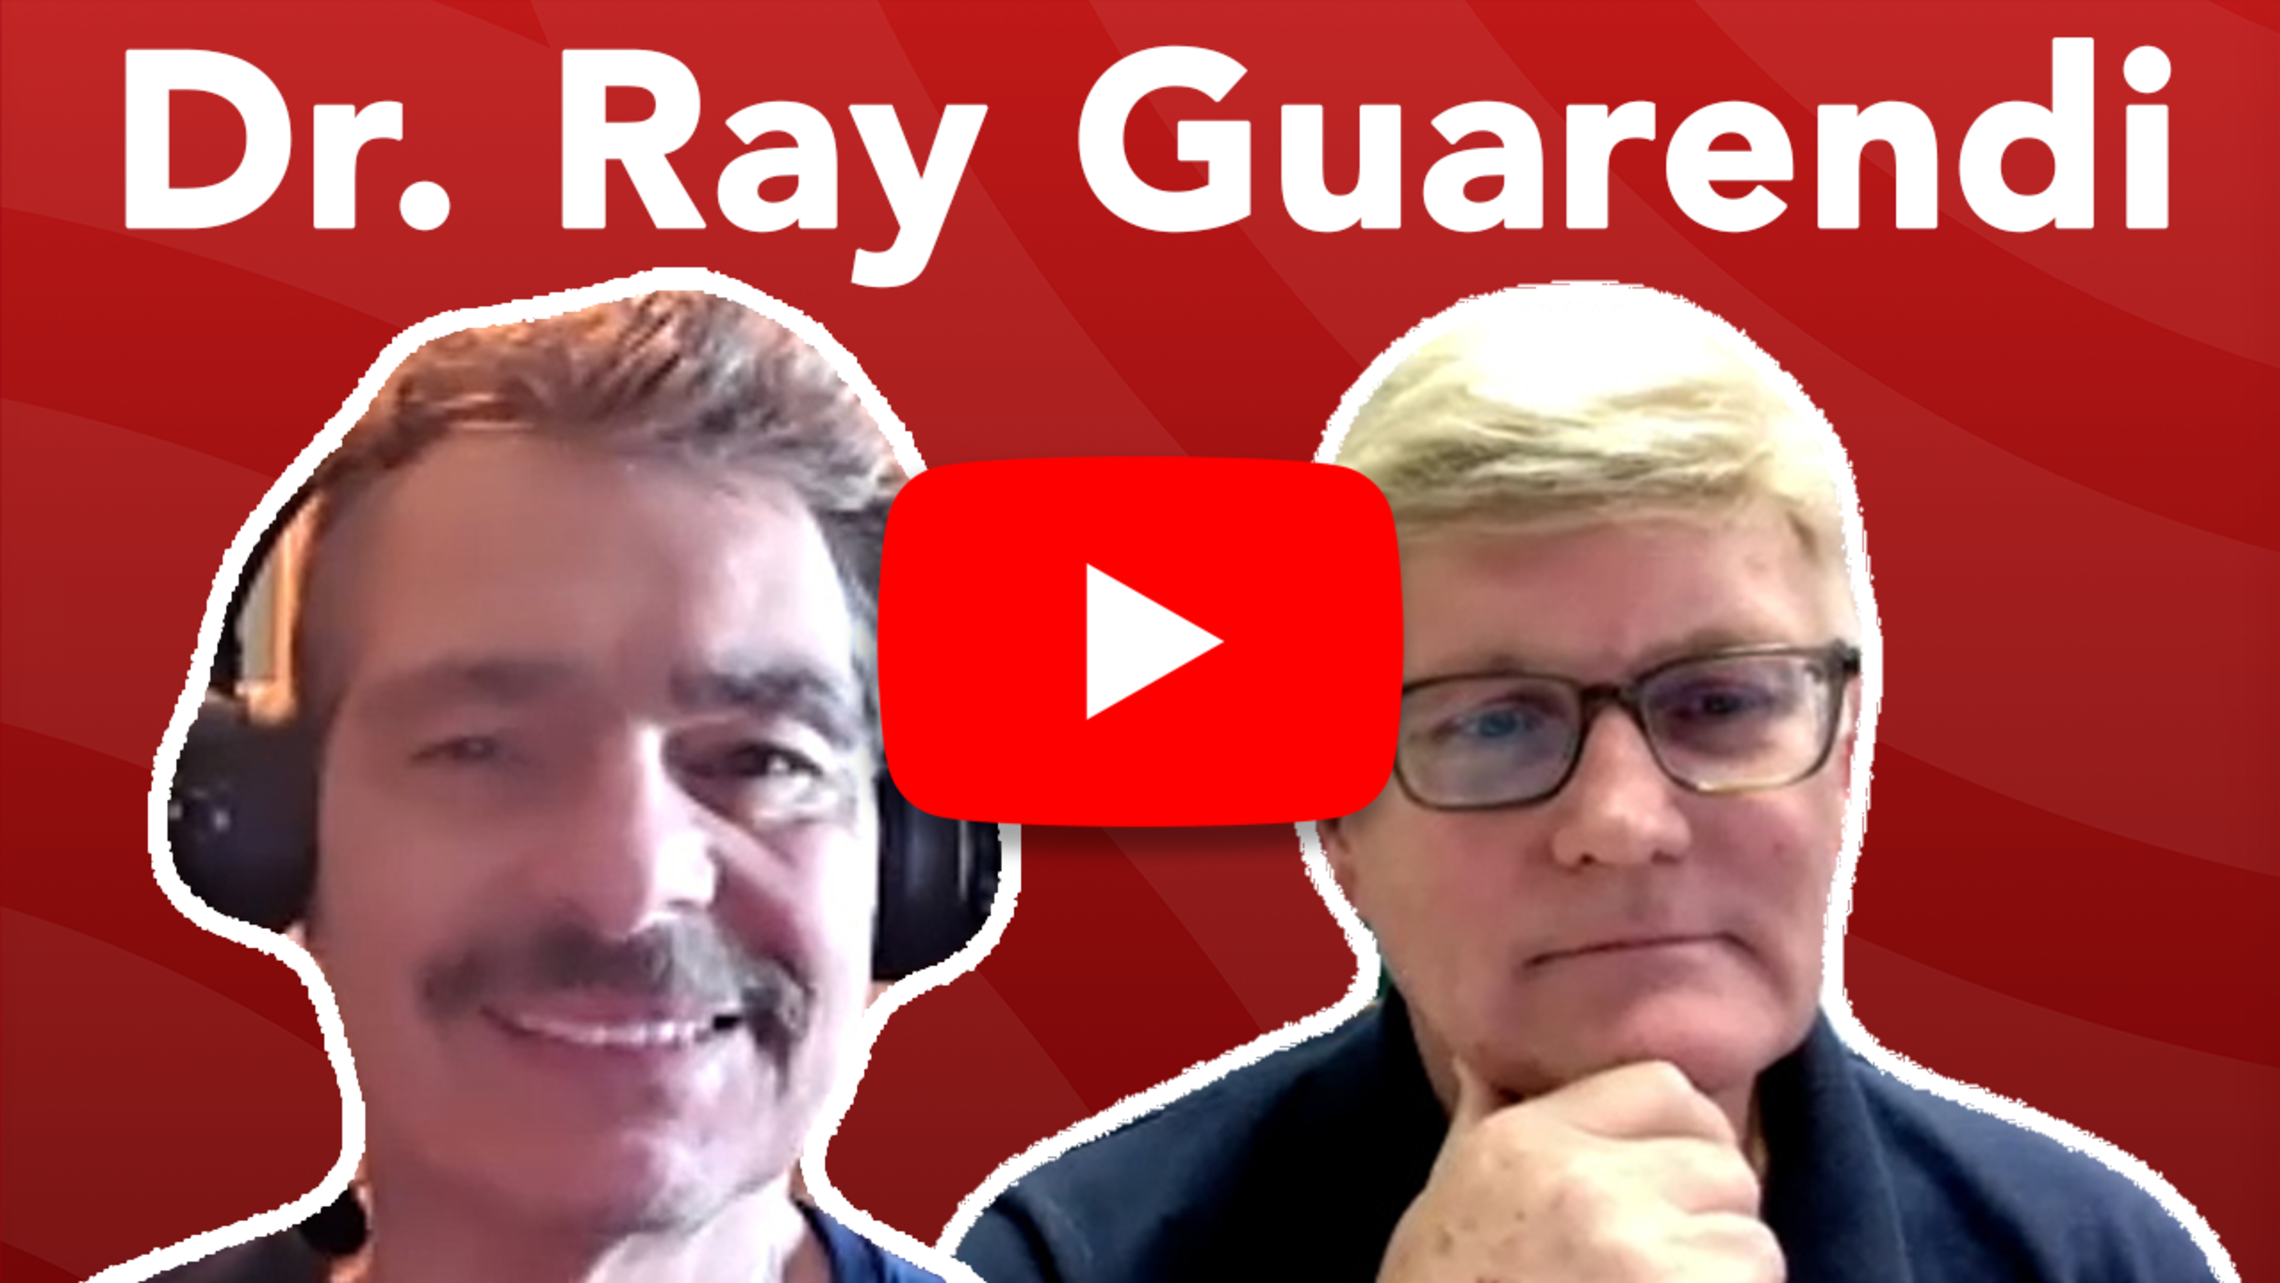 Dr. Ray Guarendi Tn Website